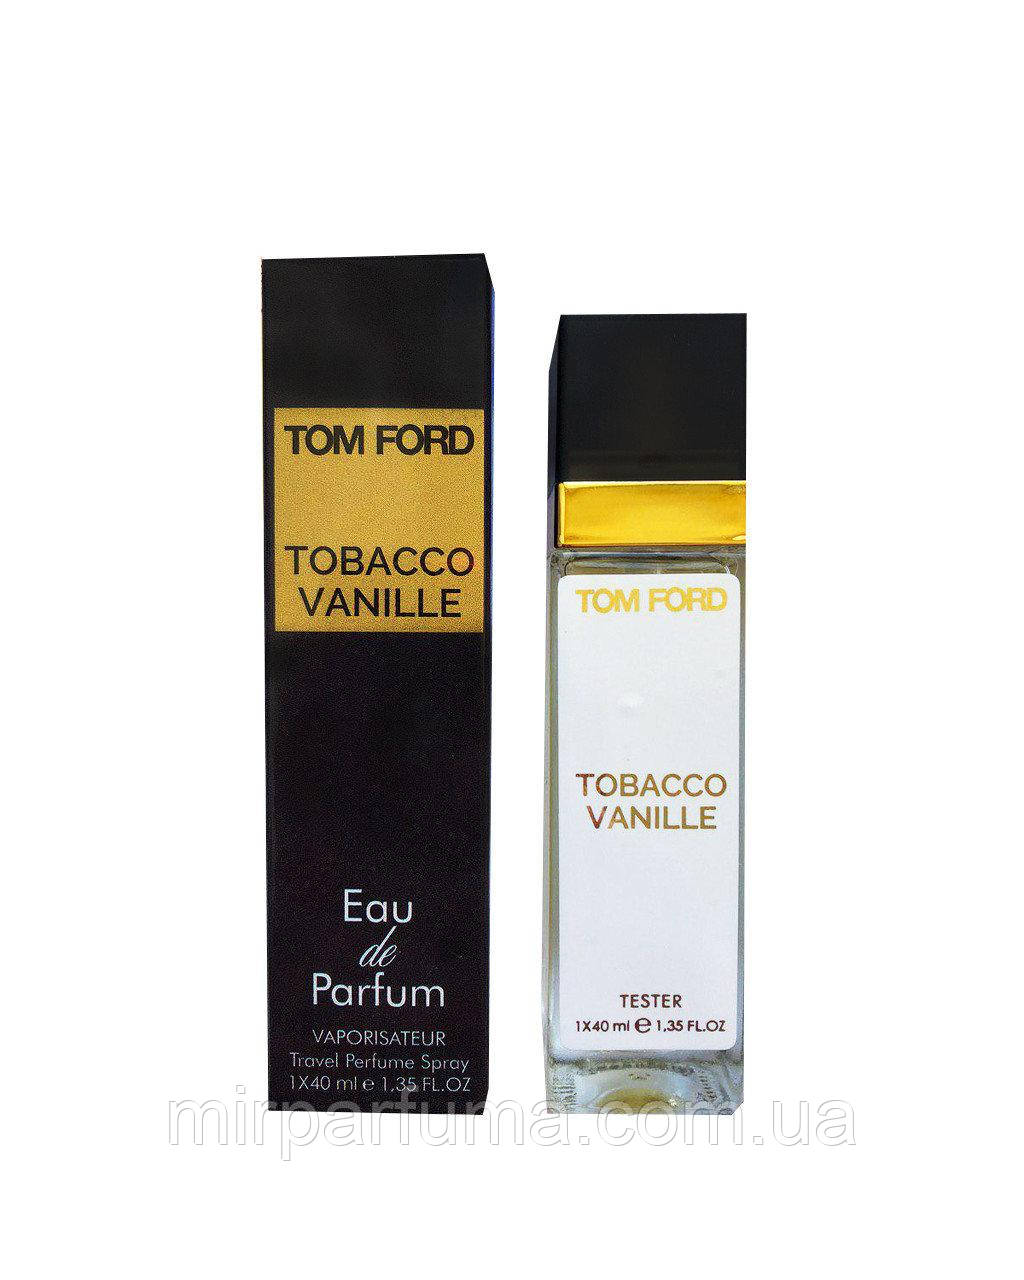 Парфюм женский реплика тестер Tom Ford Tobacco Vanille - Travel Perfume 40ml